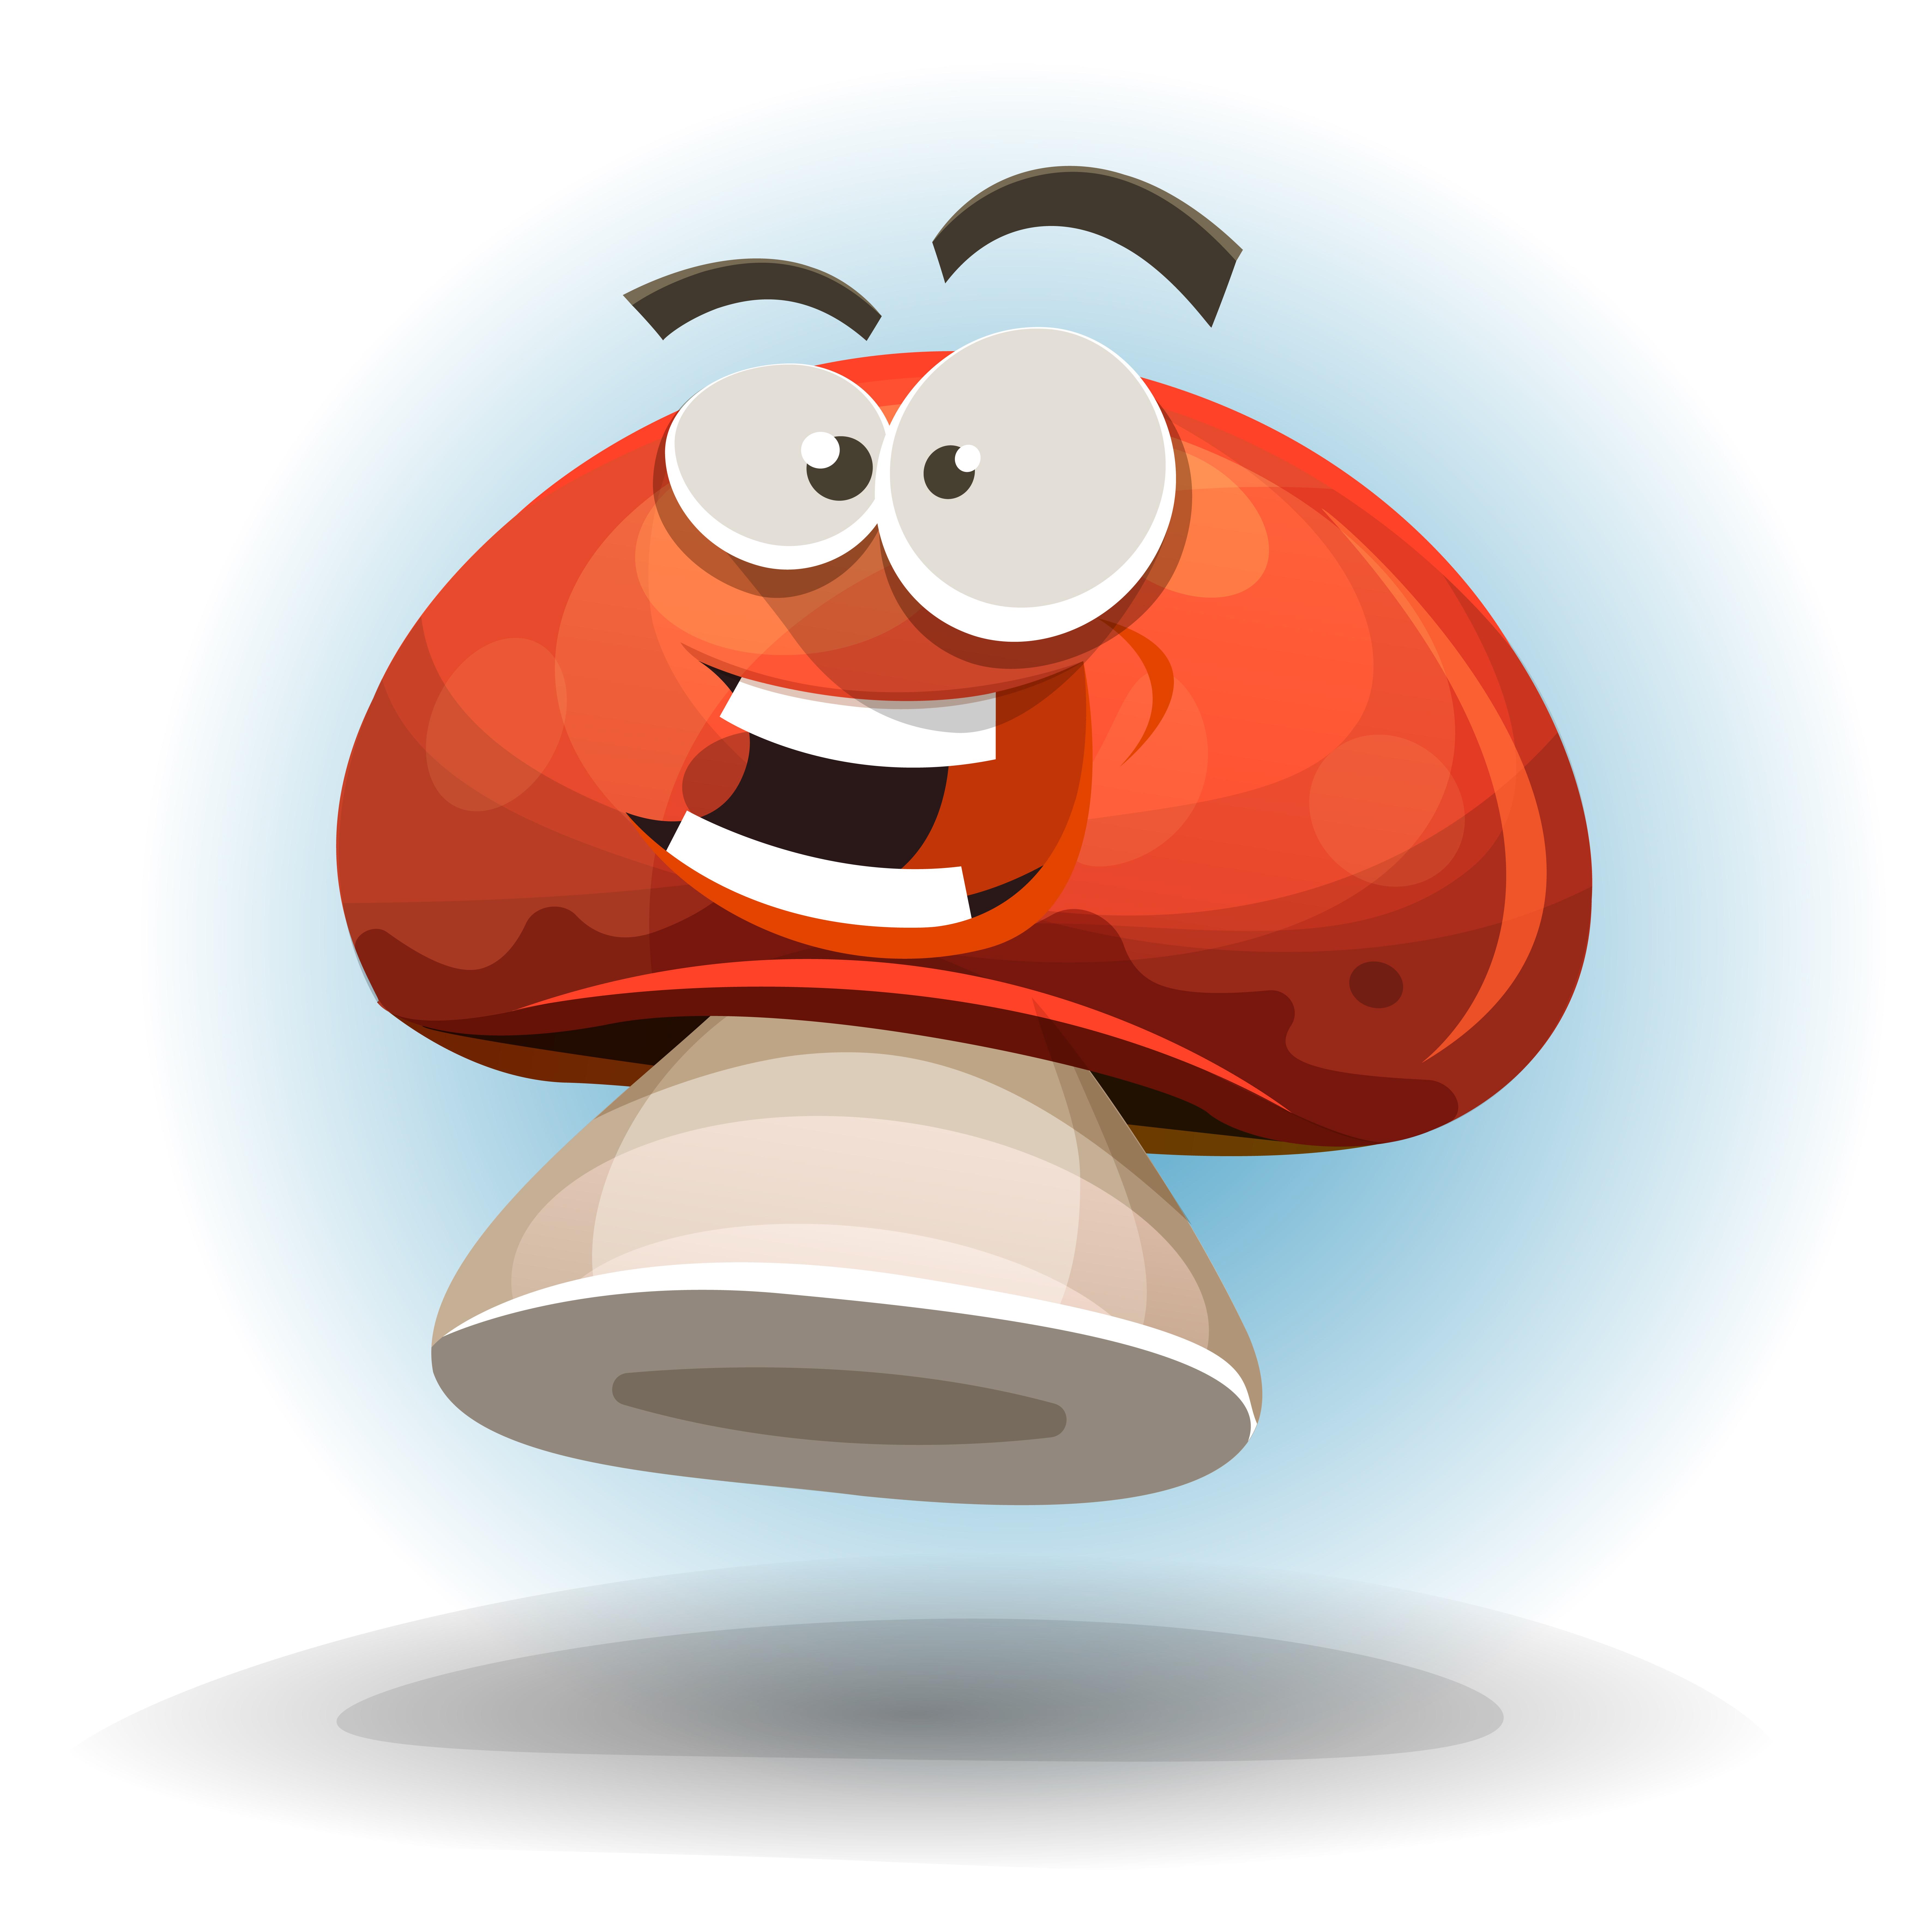 Cartoon Funny Mushroom Character - Download Free Vector ...